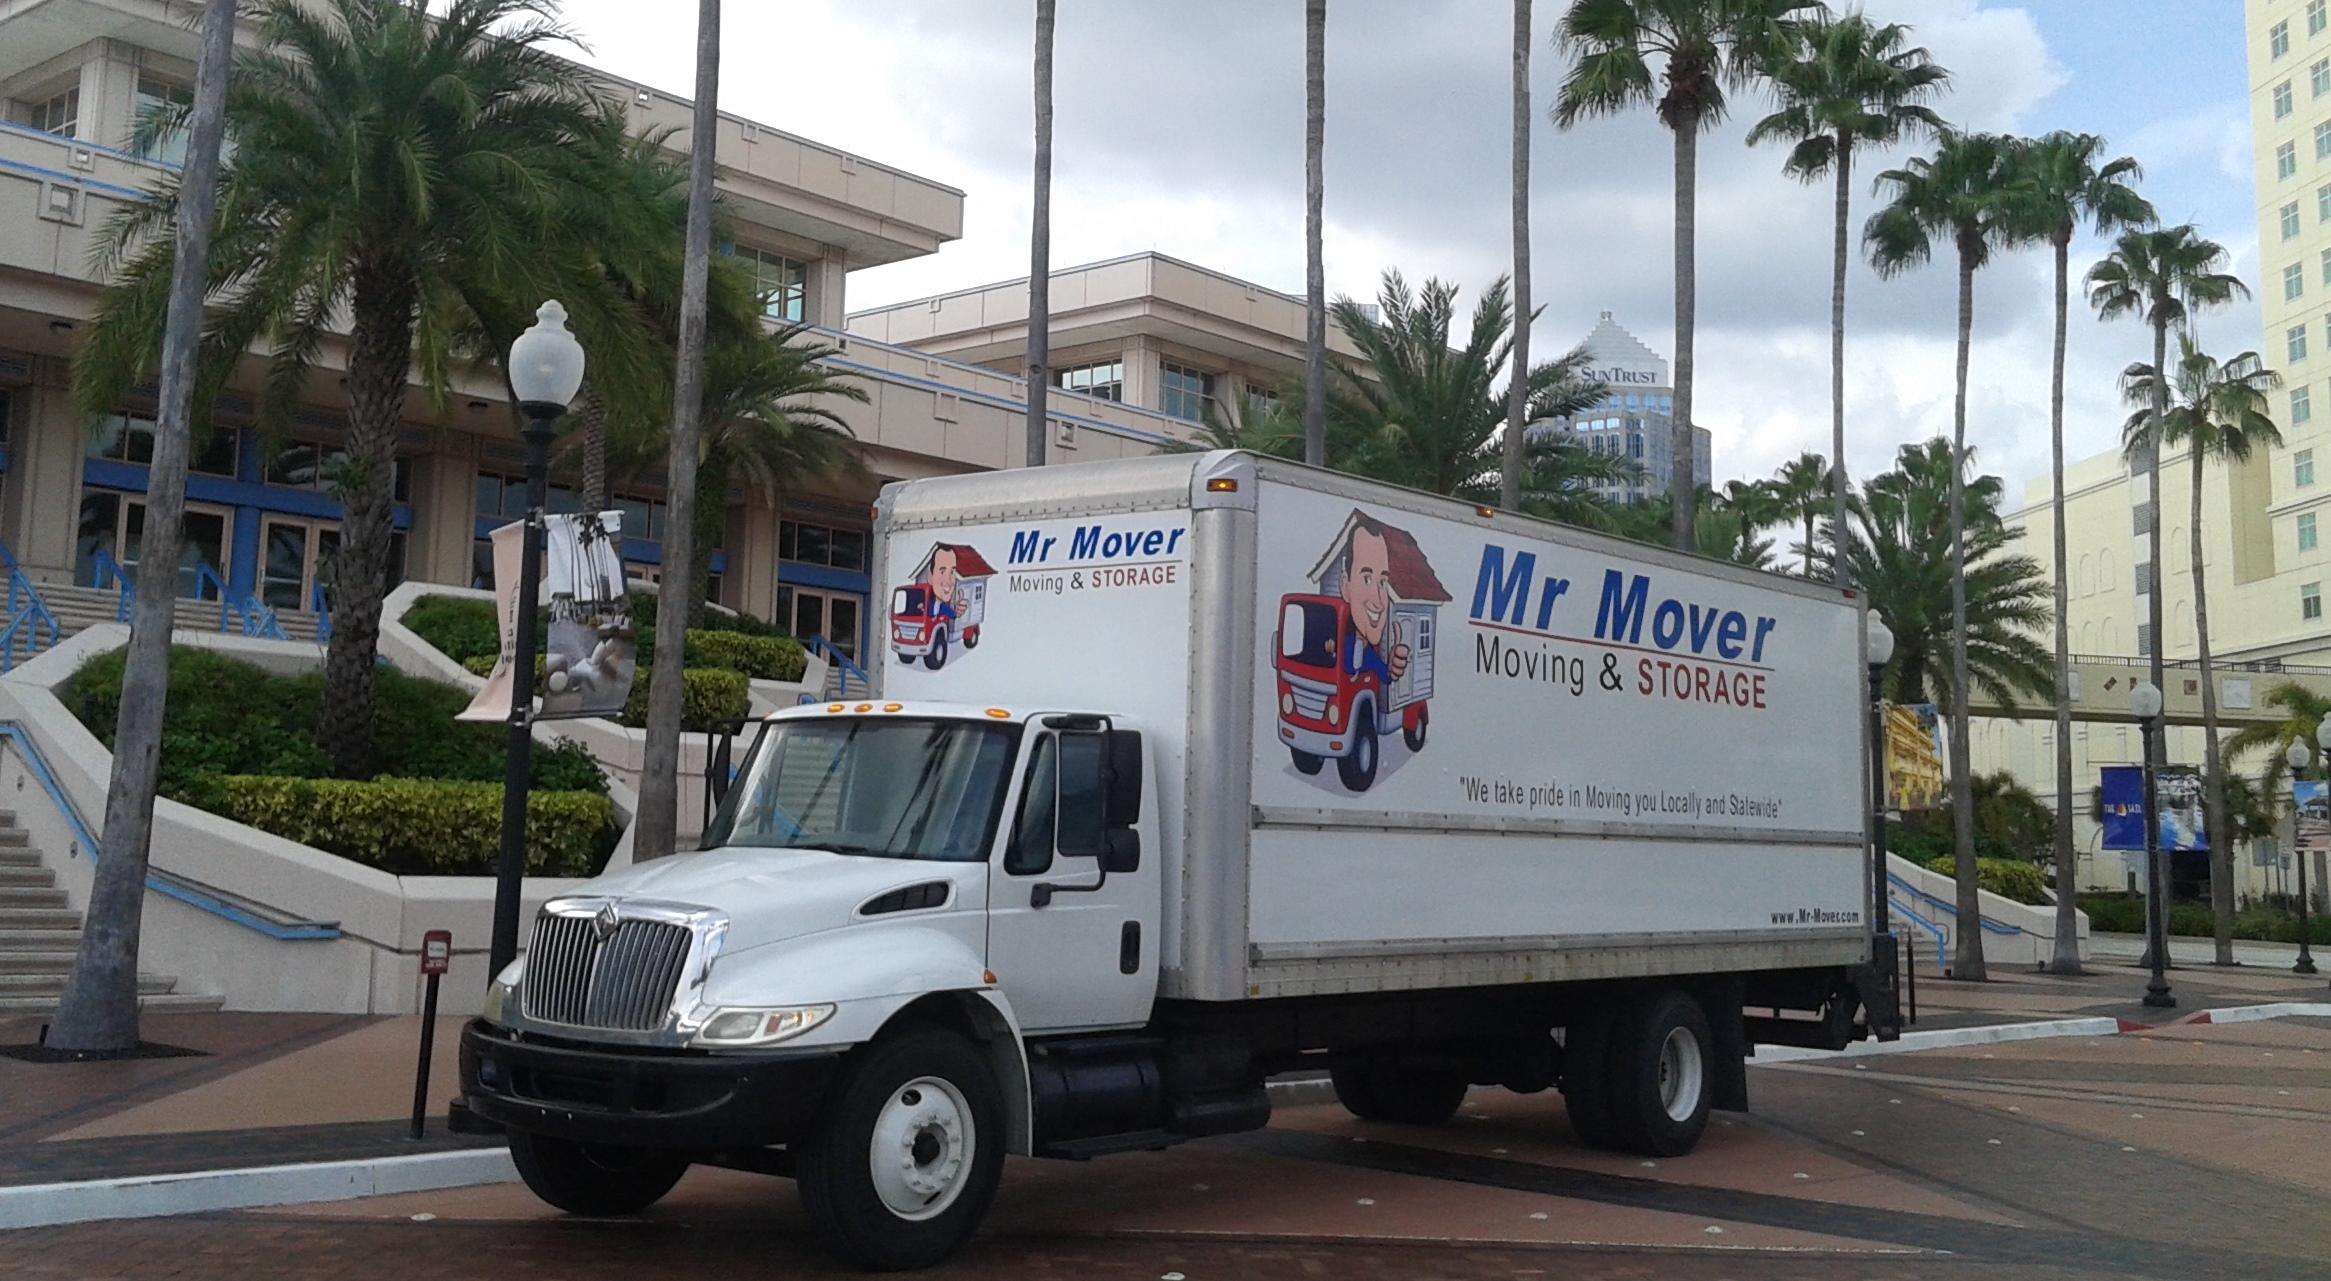 Mr. Mover image 2